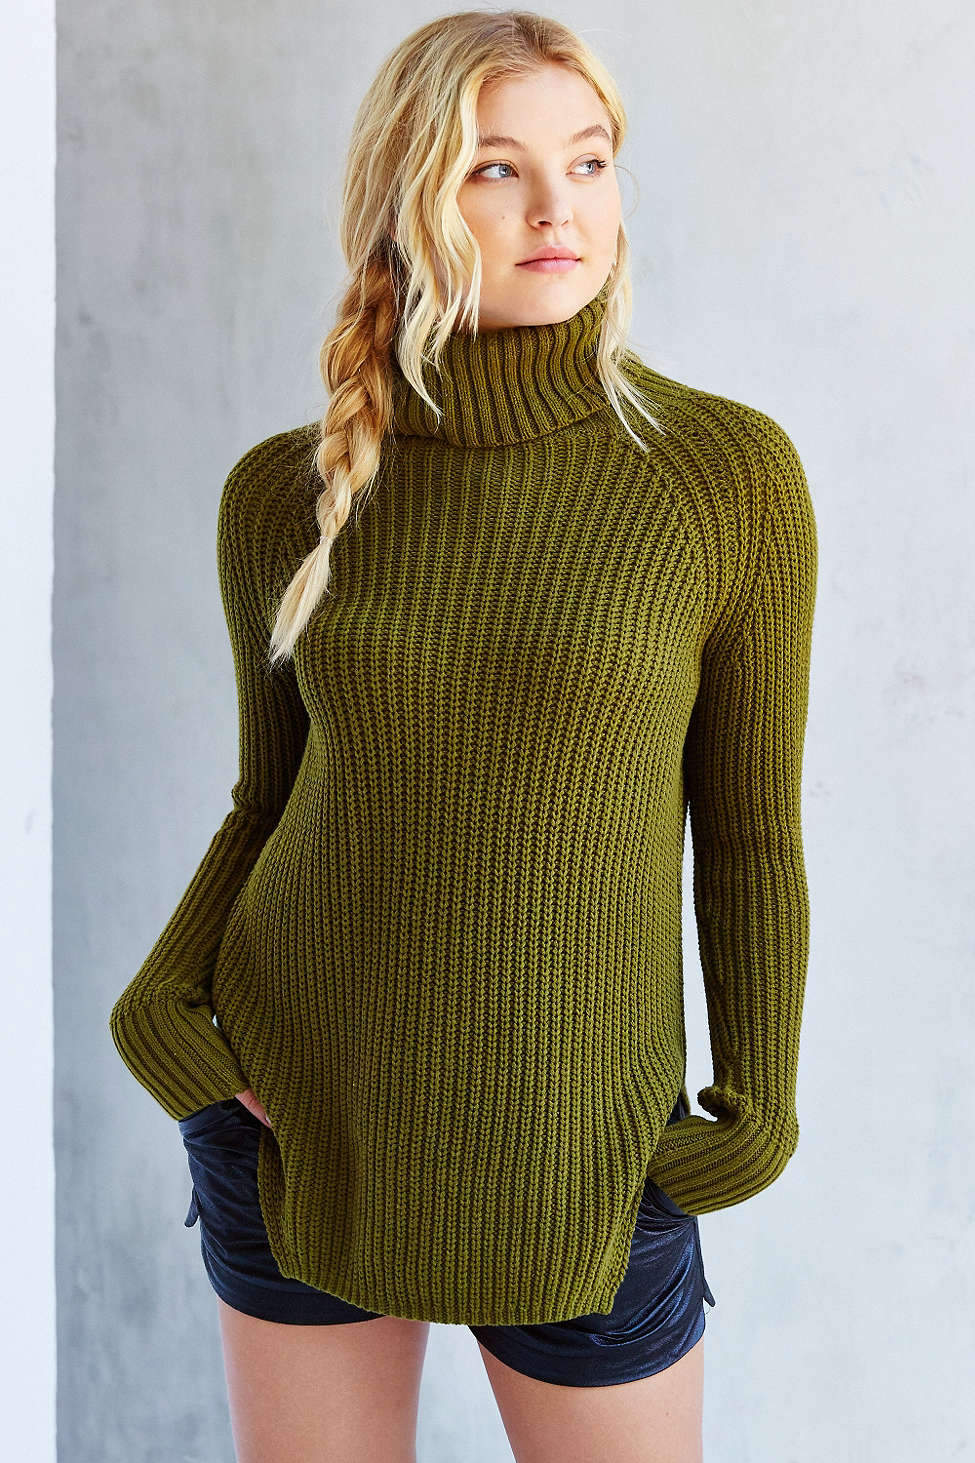 Maddy Ferguson's olive sweater.jpg